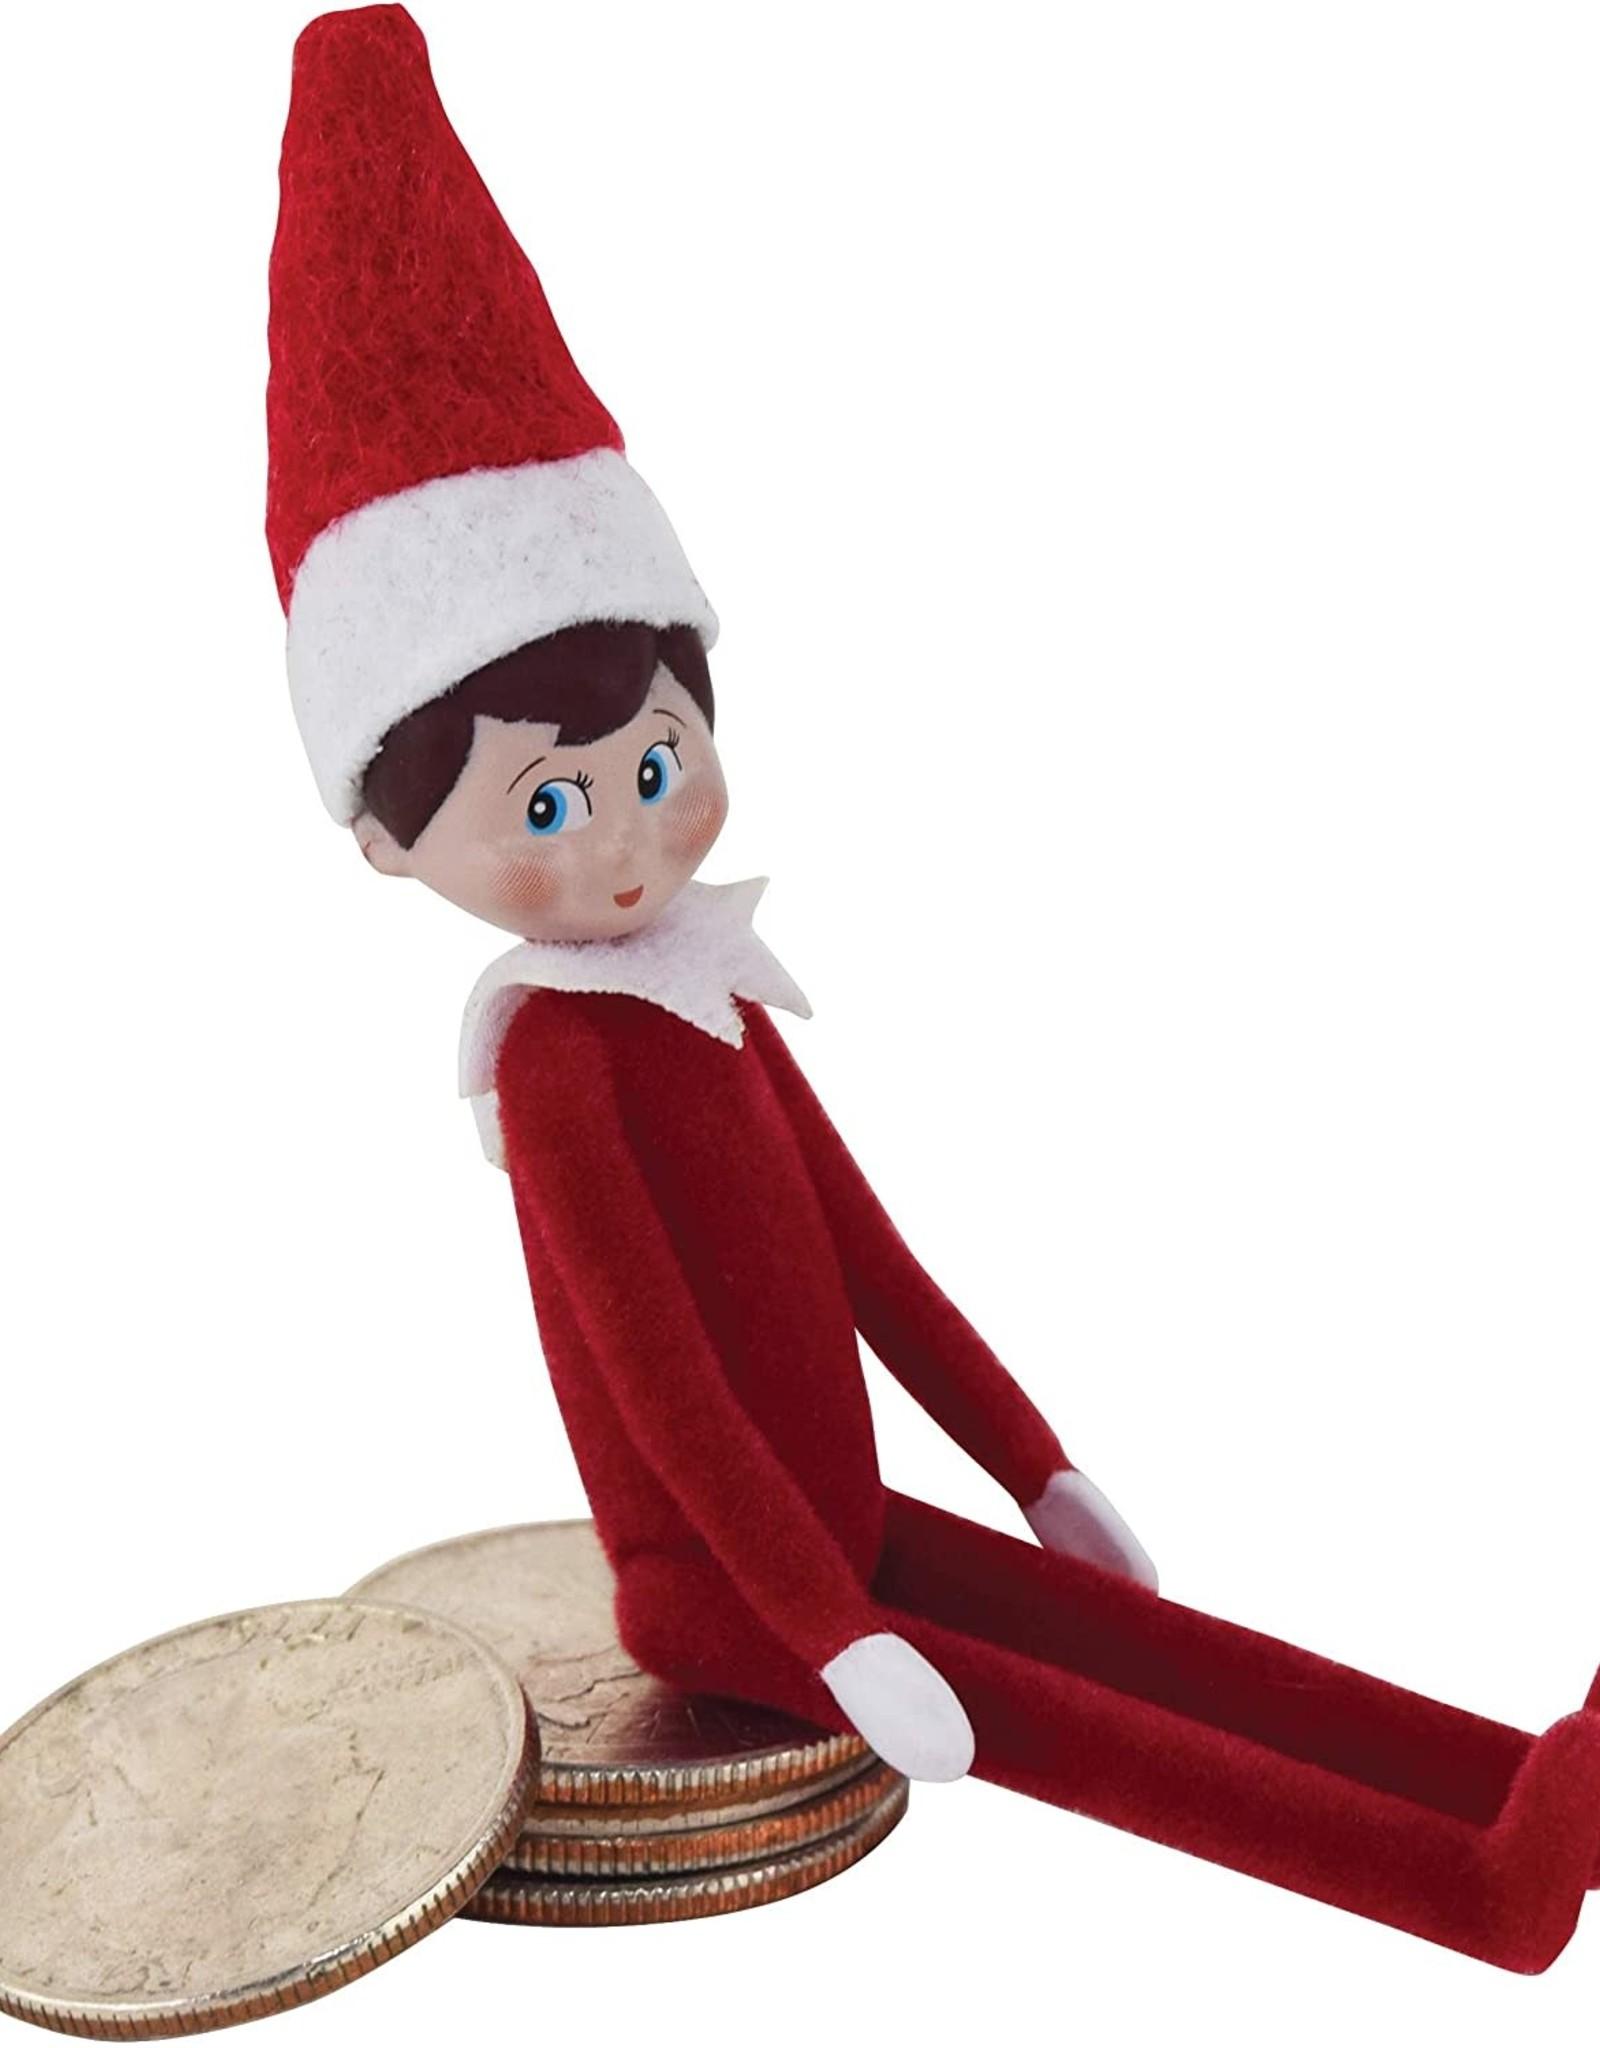 World's Smallest Elf on a Shelf